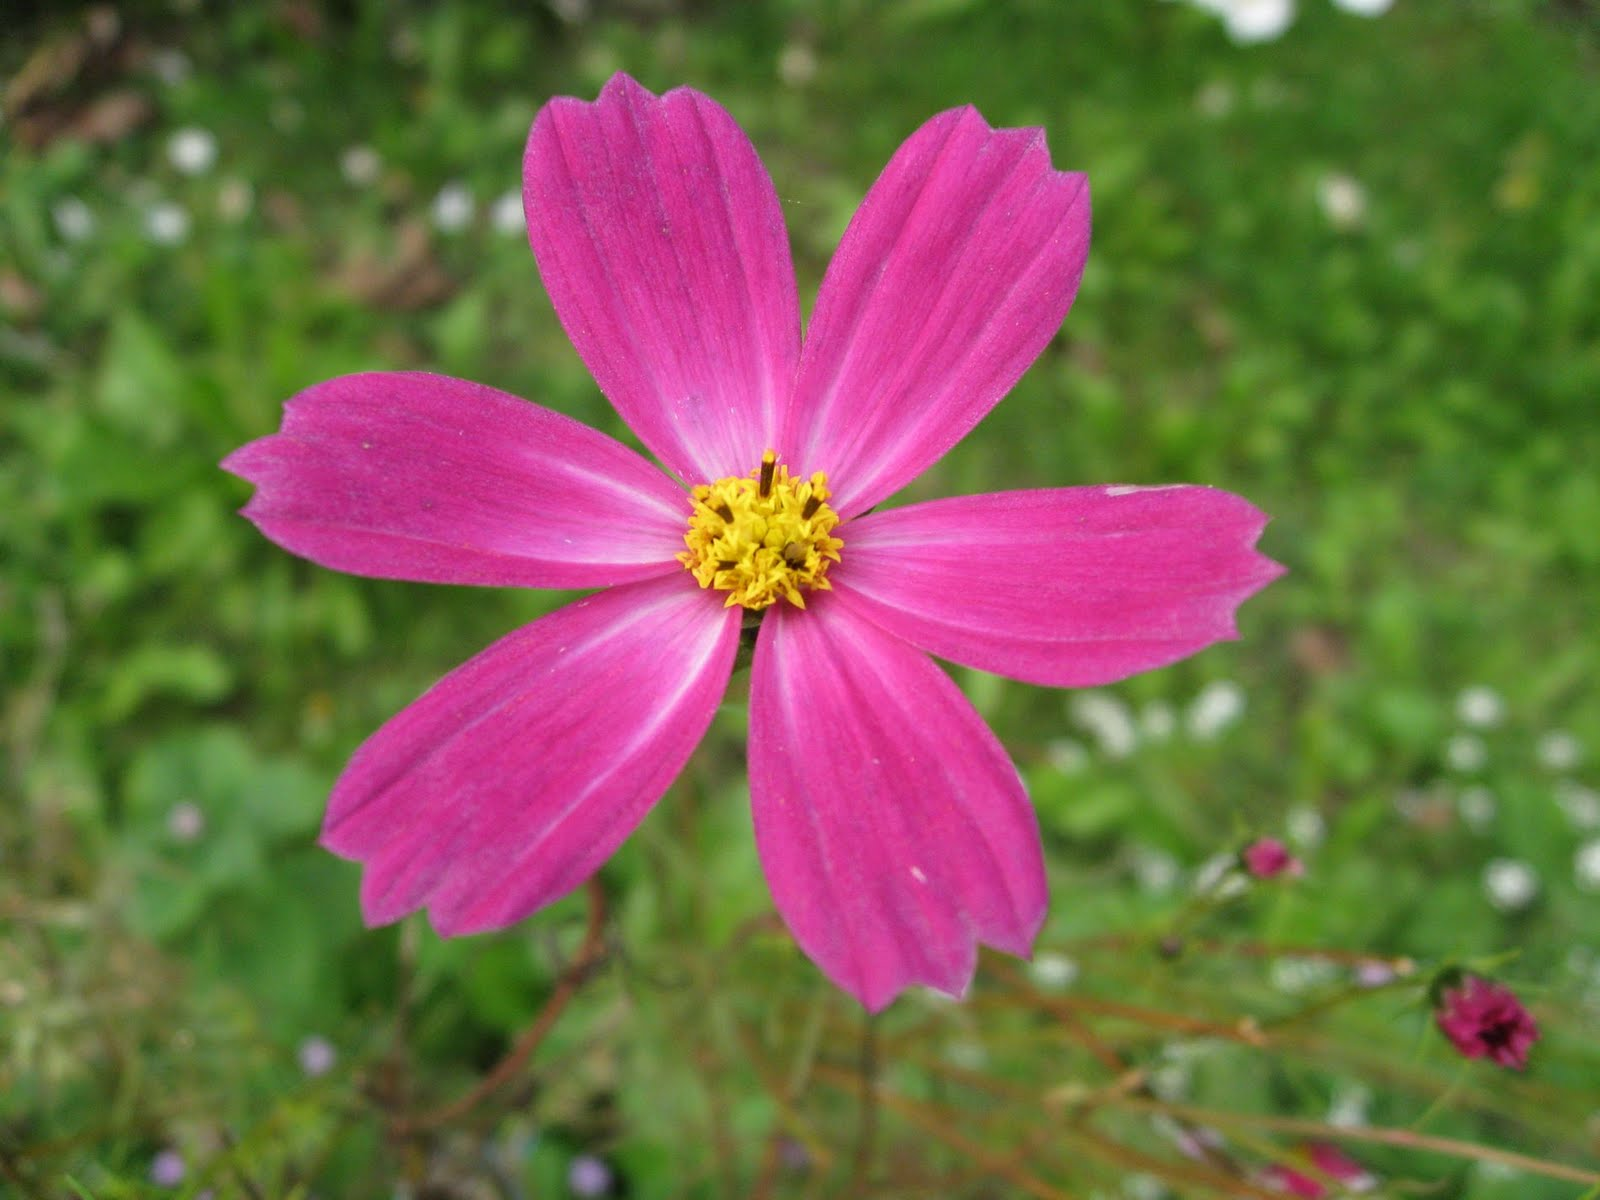 Flower Picture: Daisy Flower # 3